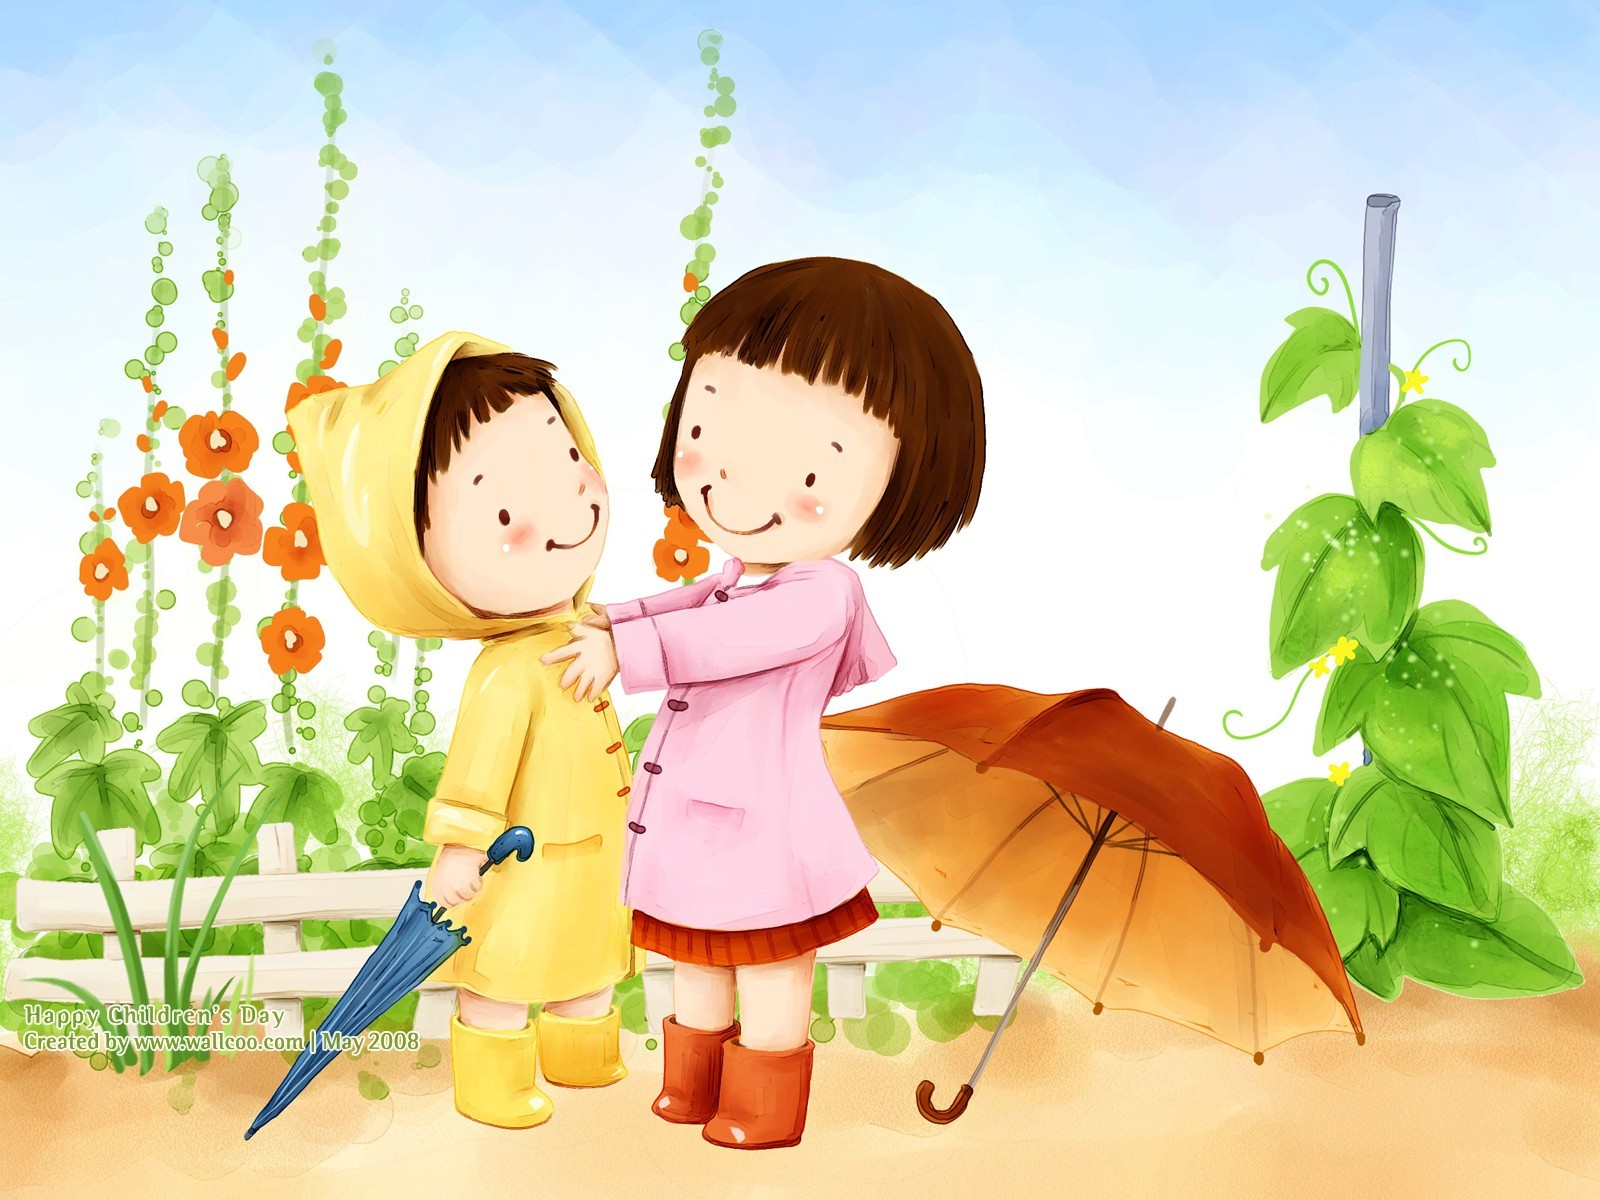 picturespool  children u0026 39 s day wallpaper greetings